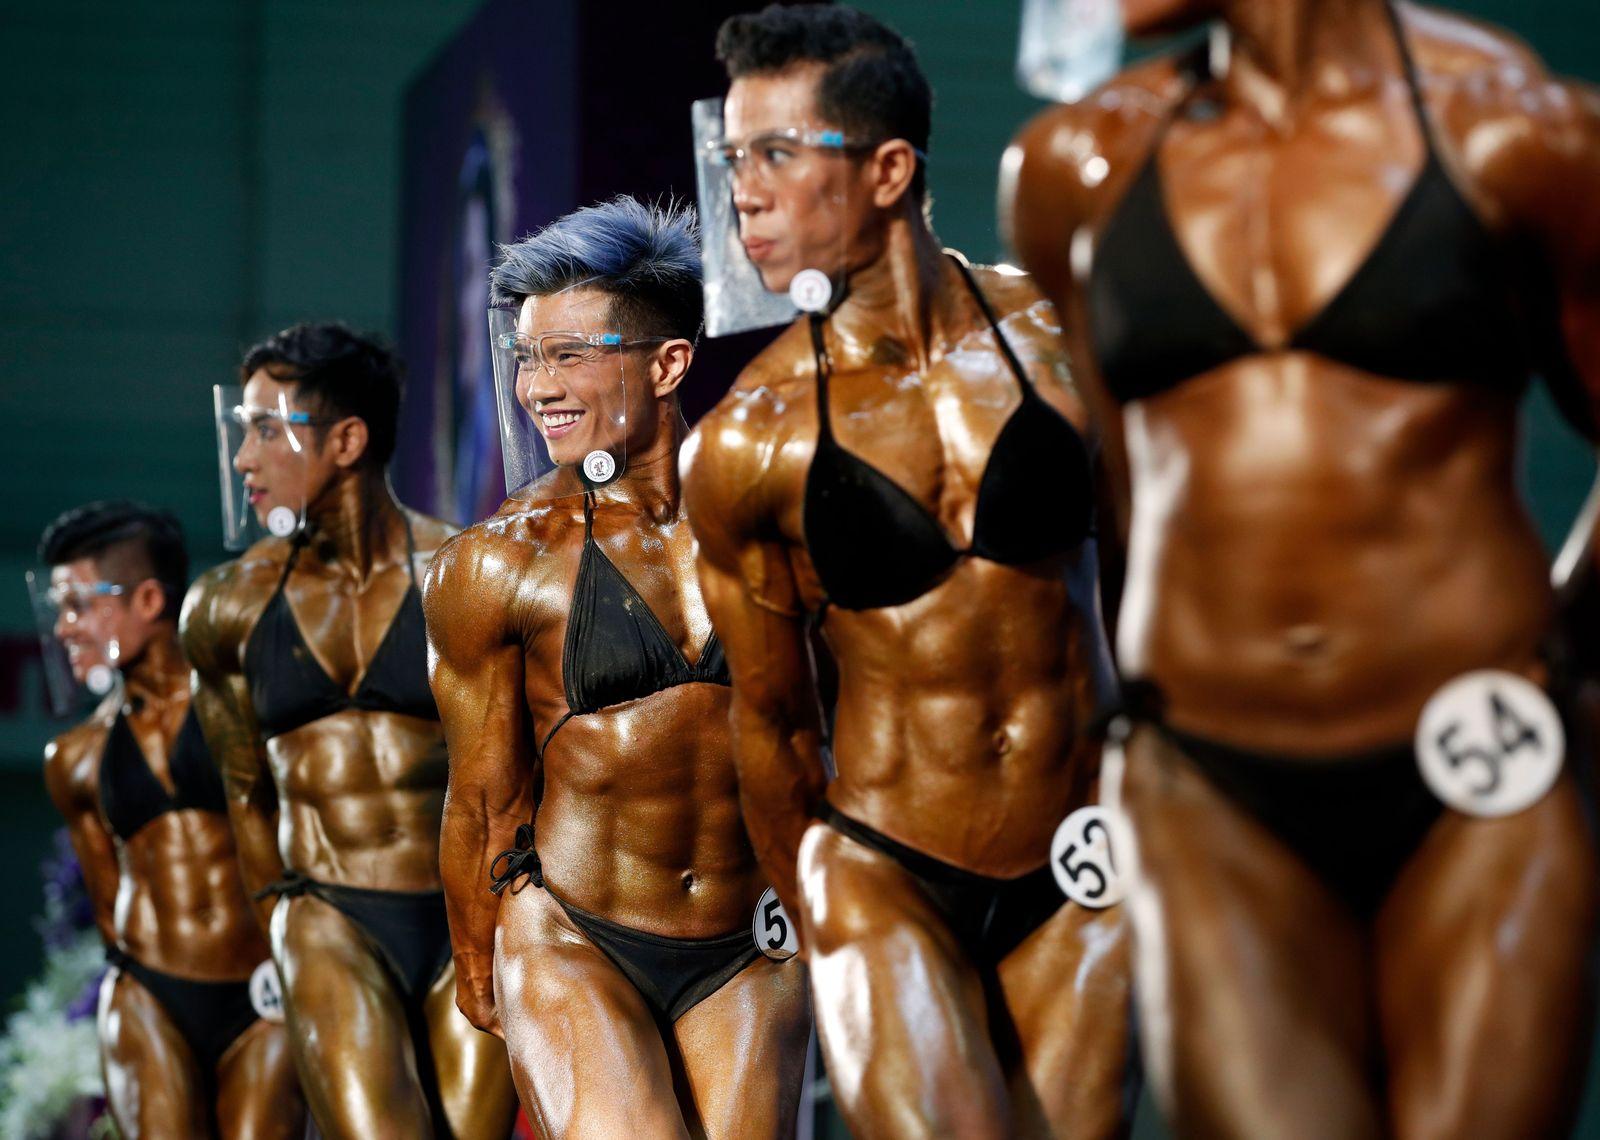 Mr. Thailand 2020 Bodybuilding contest in Bangkok - 21 Aug 2020